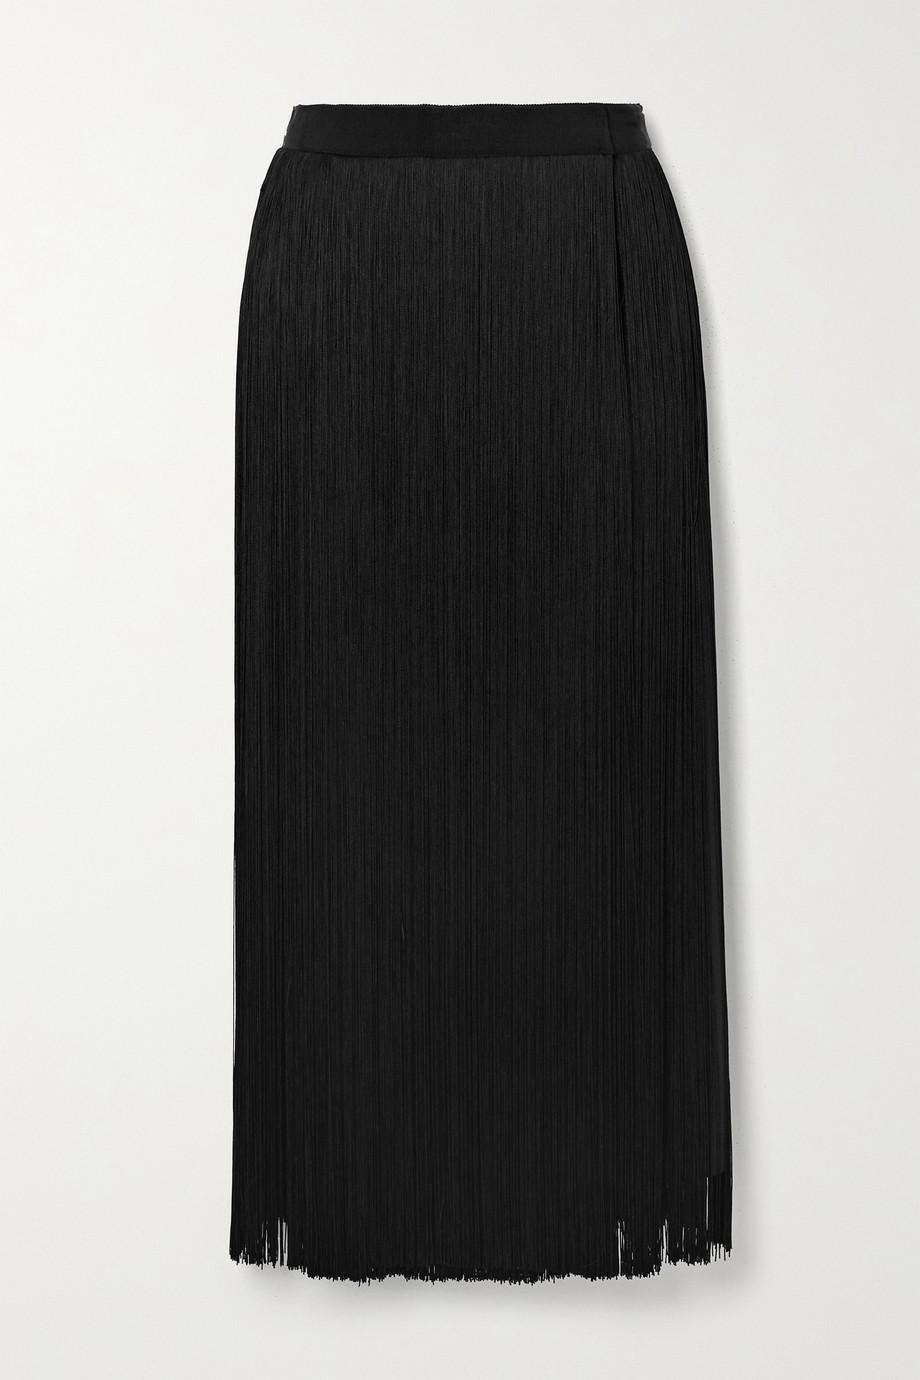 Prada Fringed silk crepe de chine midi skirt